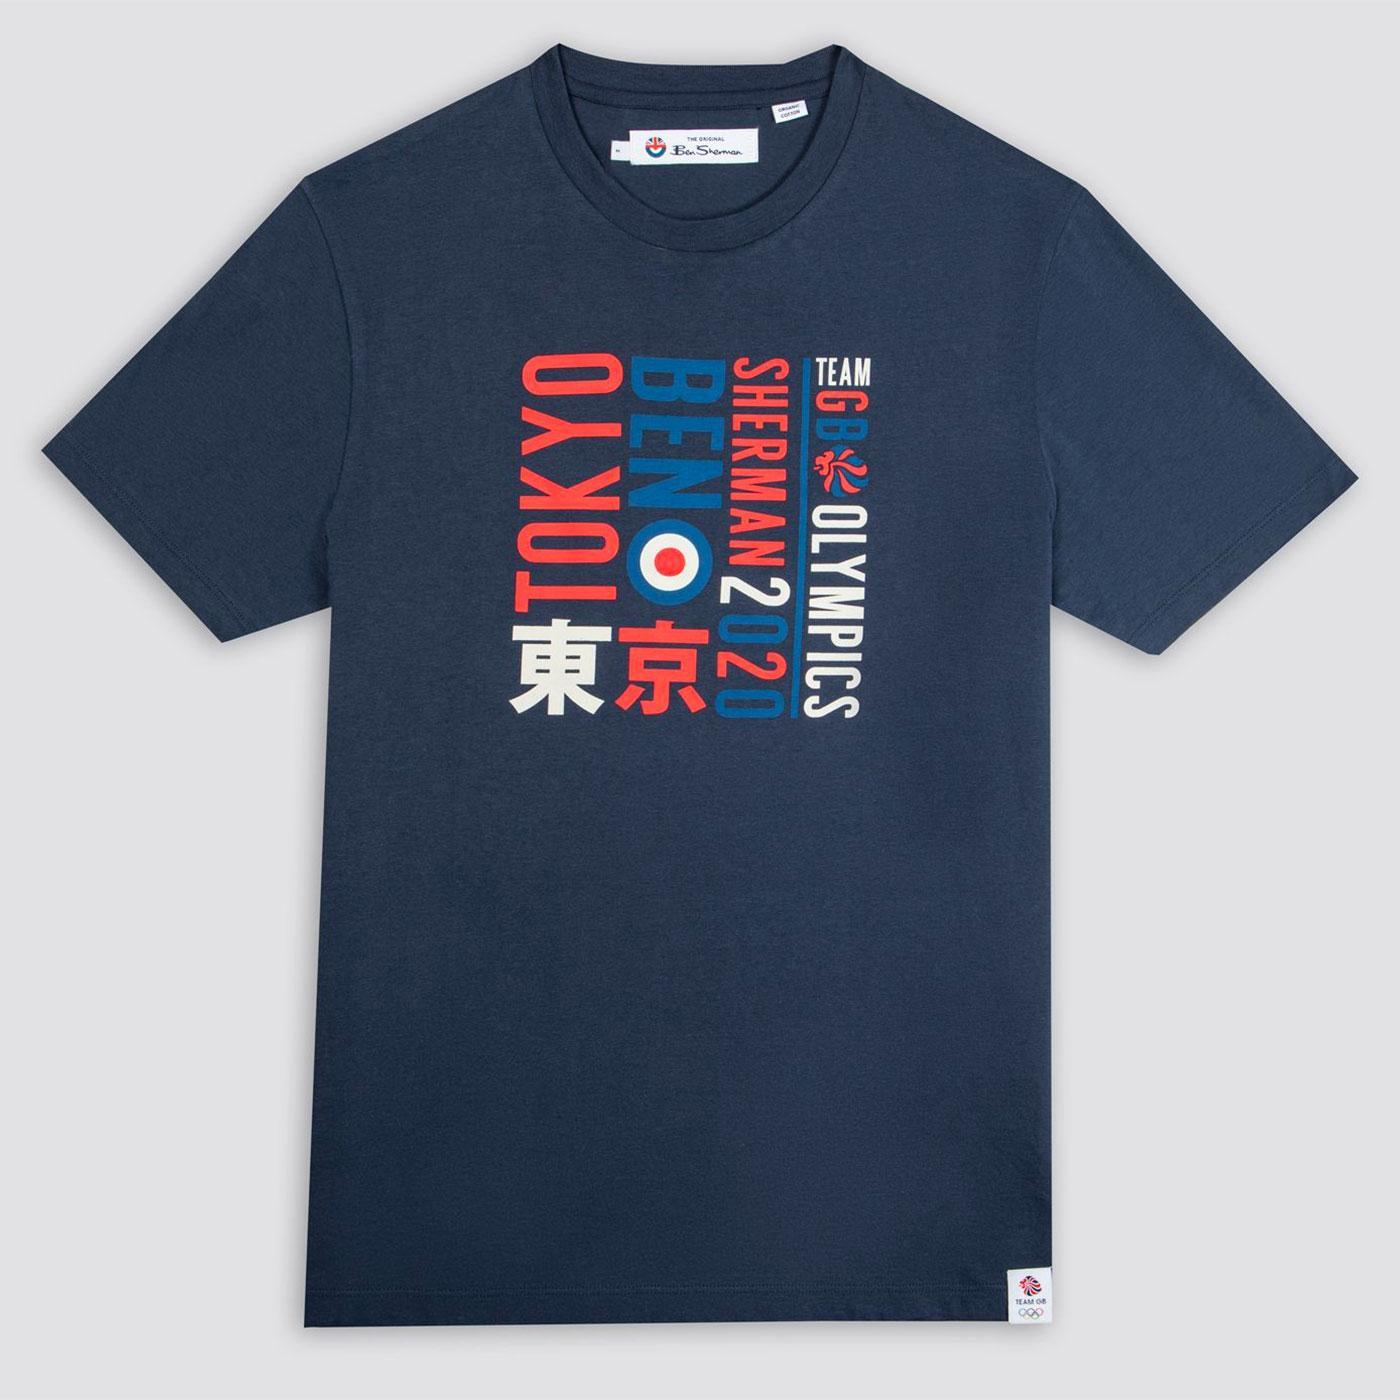 BEN SHERMAN x Team GB Tokyo Type Retro Tee